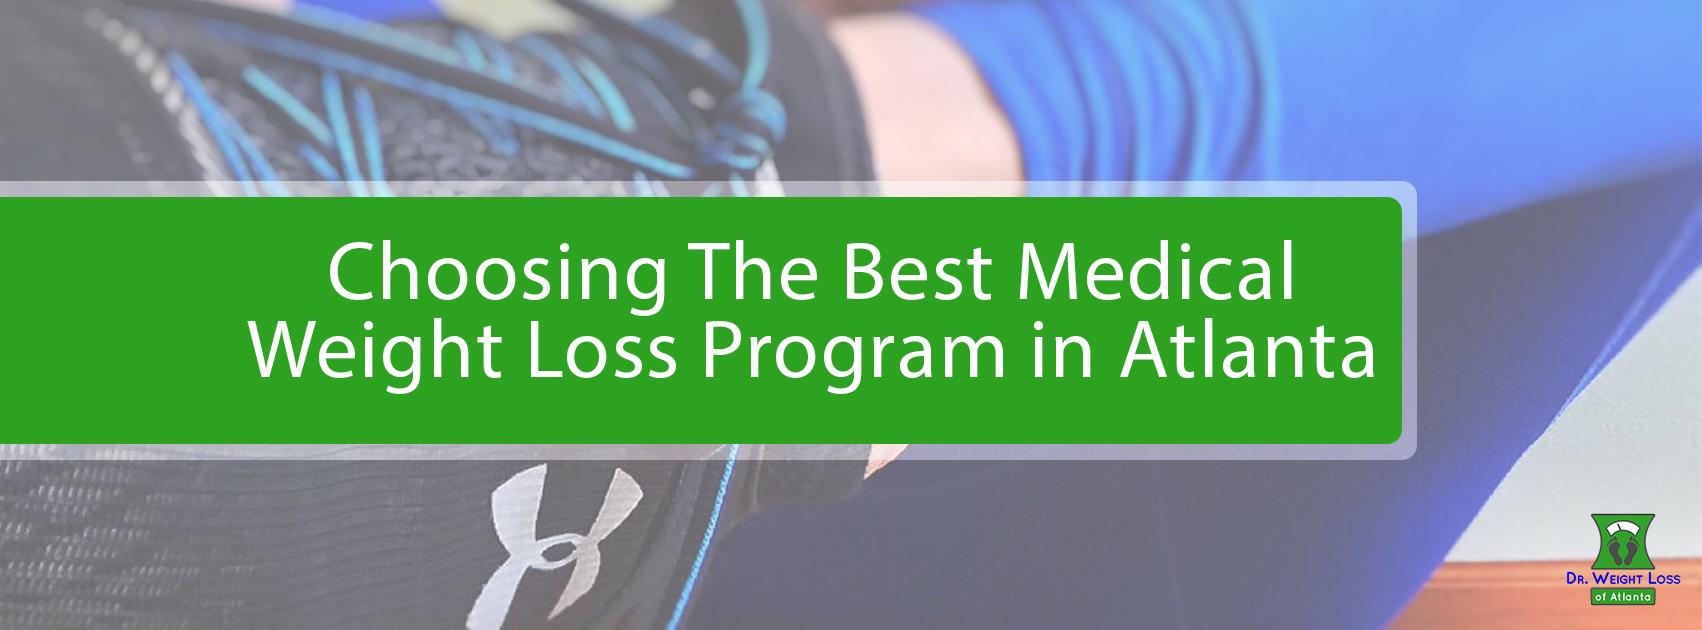 Choosing The Best Medical Weight Loss Program In Atlanta